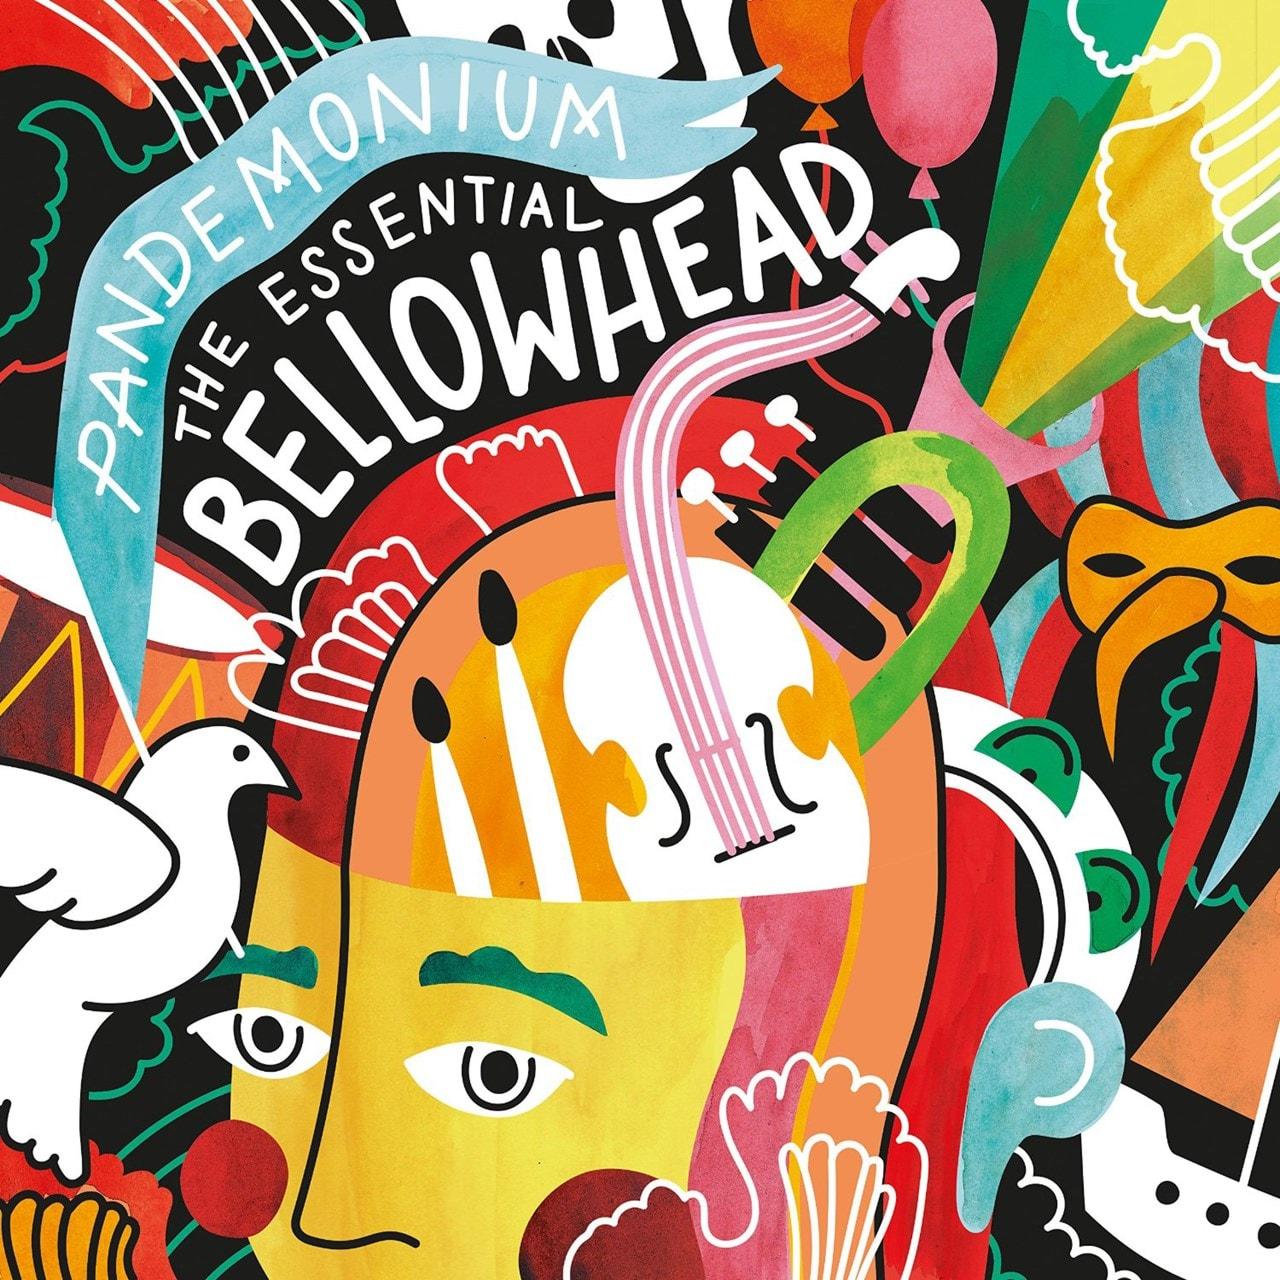 Pandemonium: The Essential Bellowhead - 1